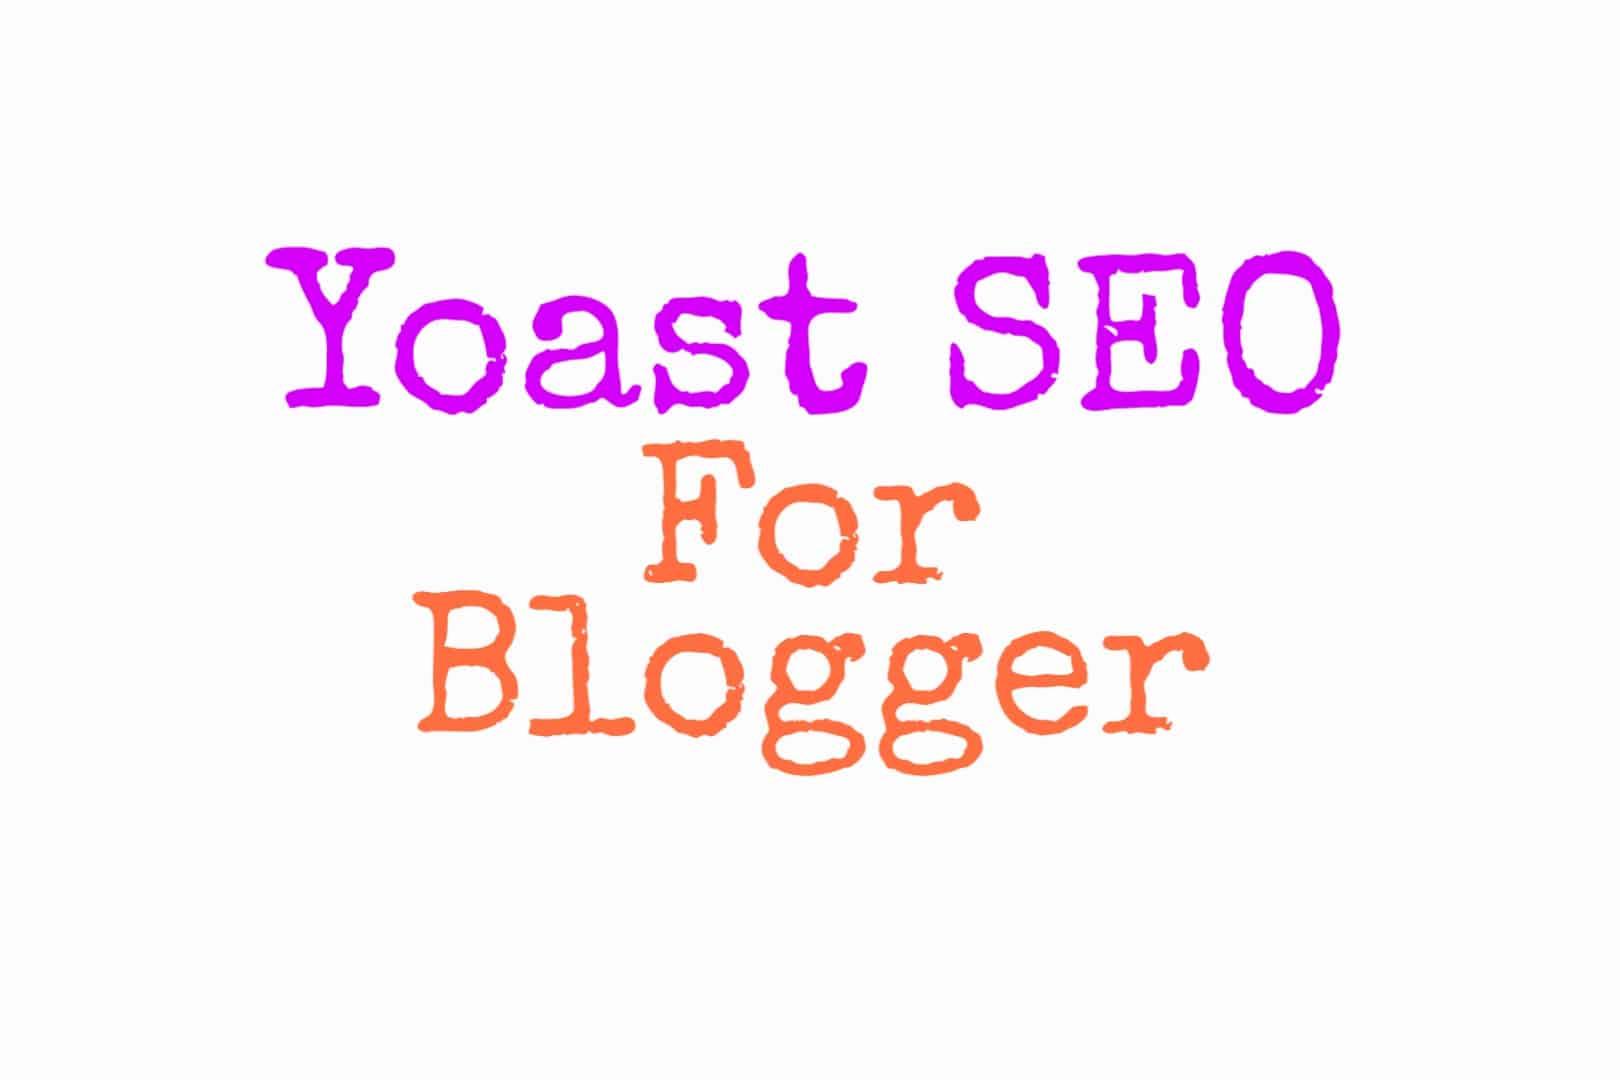 Yoast SEO for Blogger